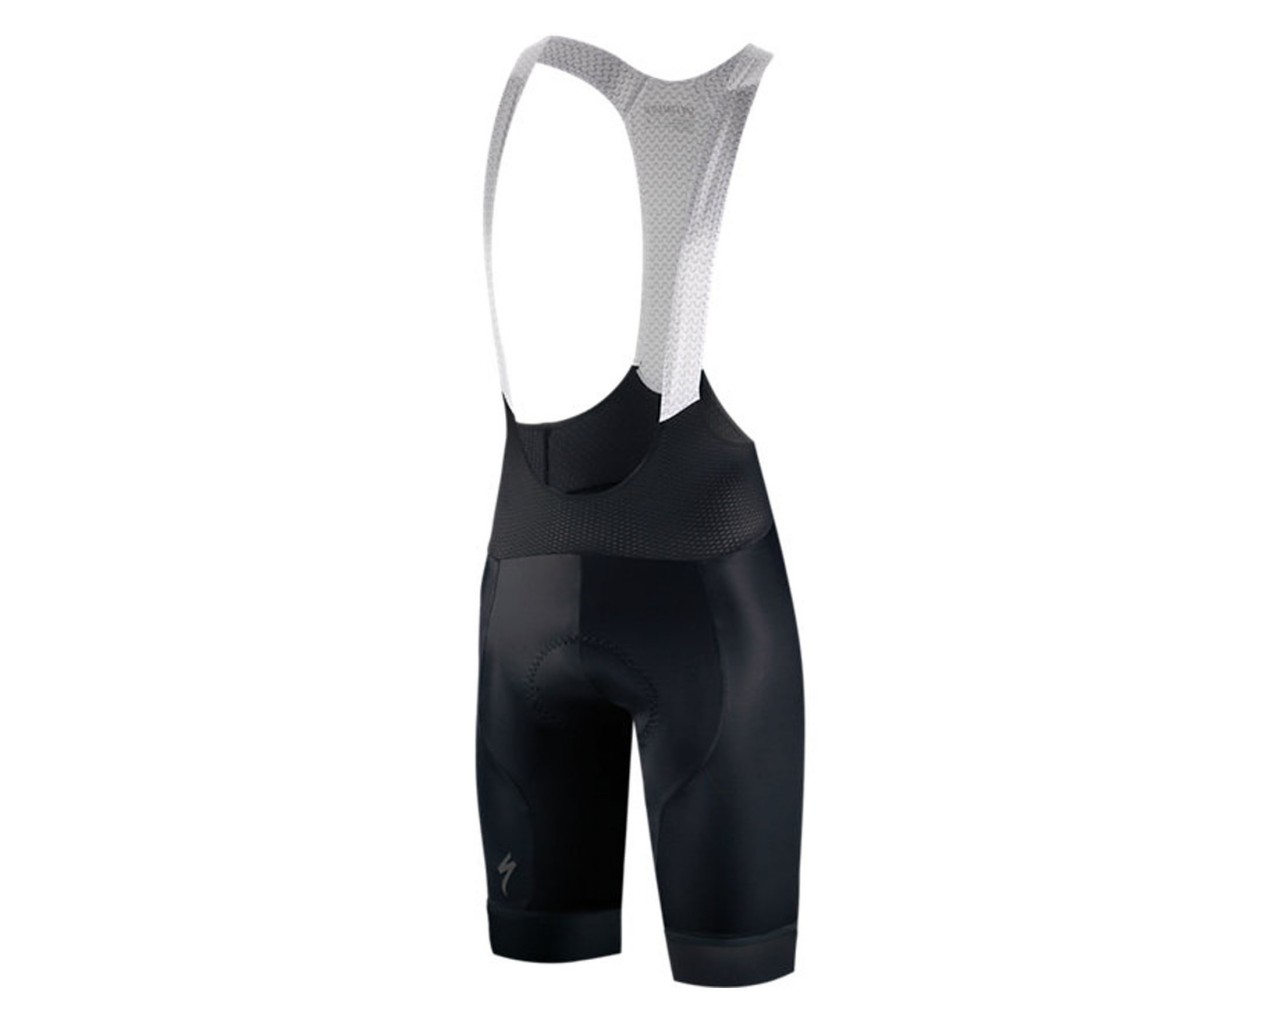 Specialized SL Bib Shorts | black